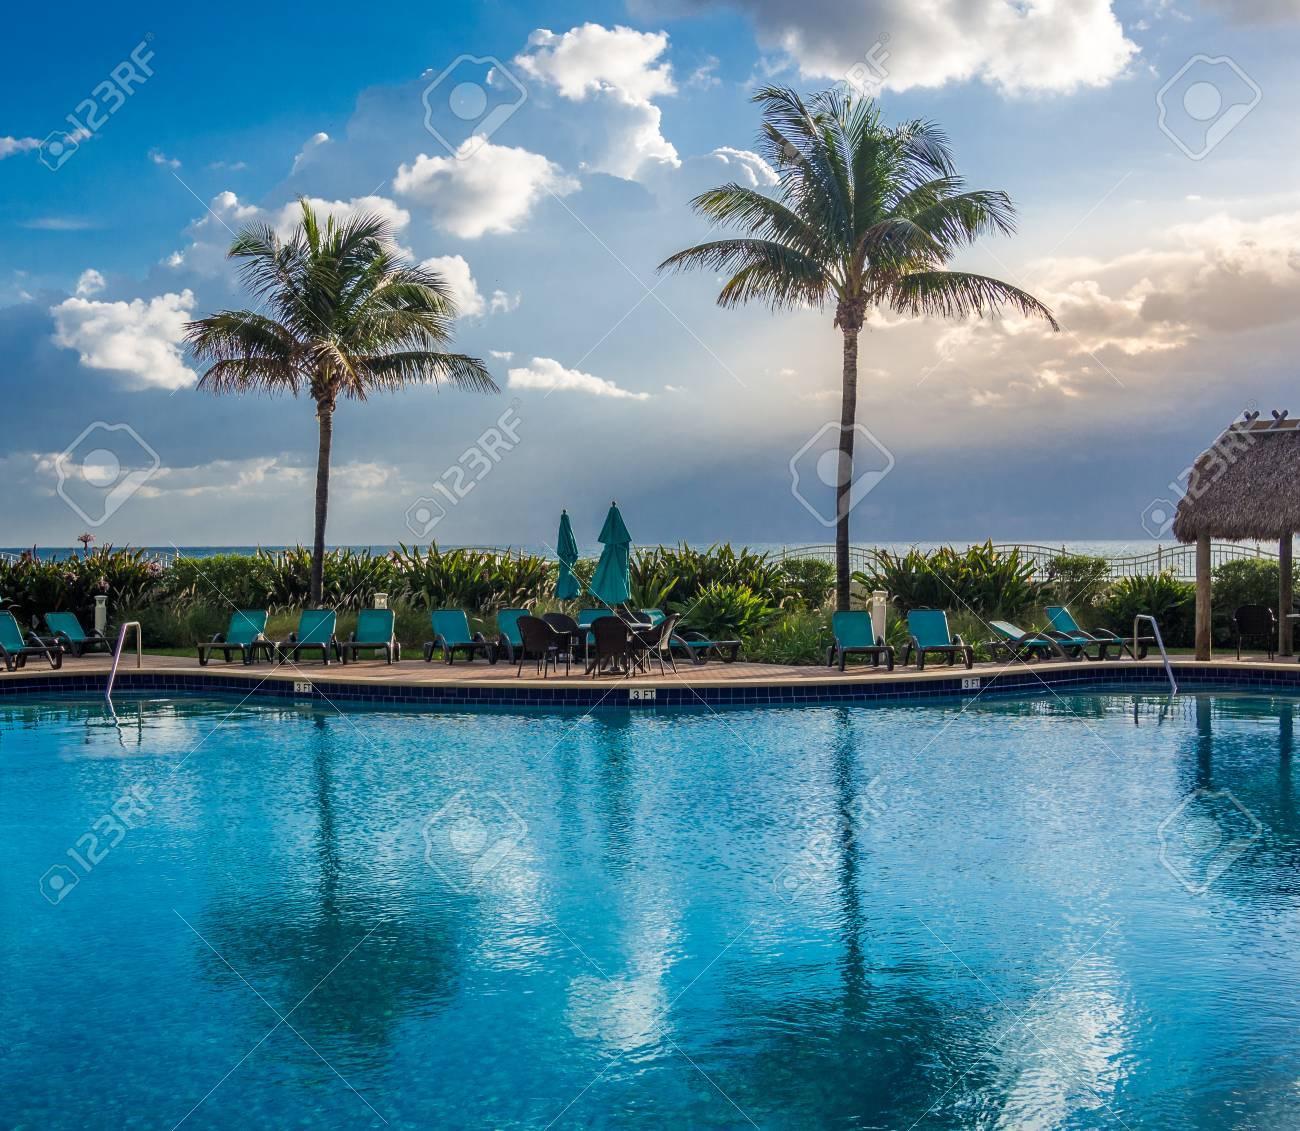 Empty pool at tropical resort at the morning - 69688577